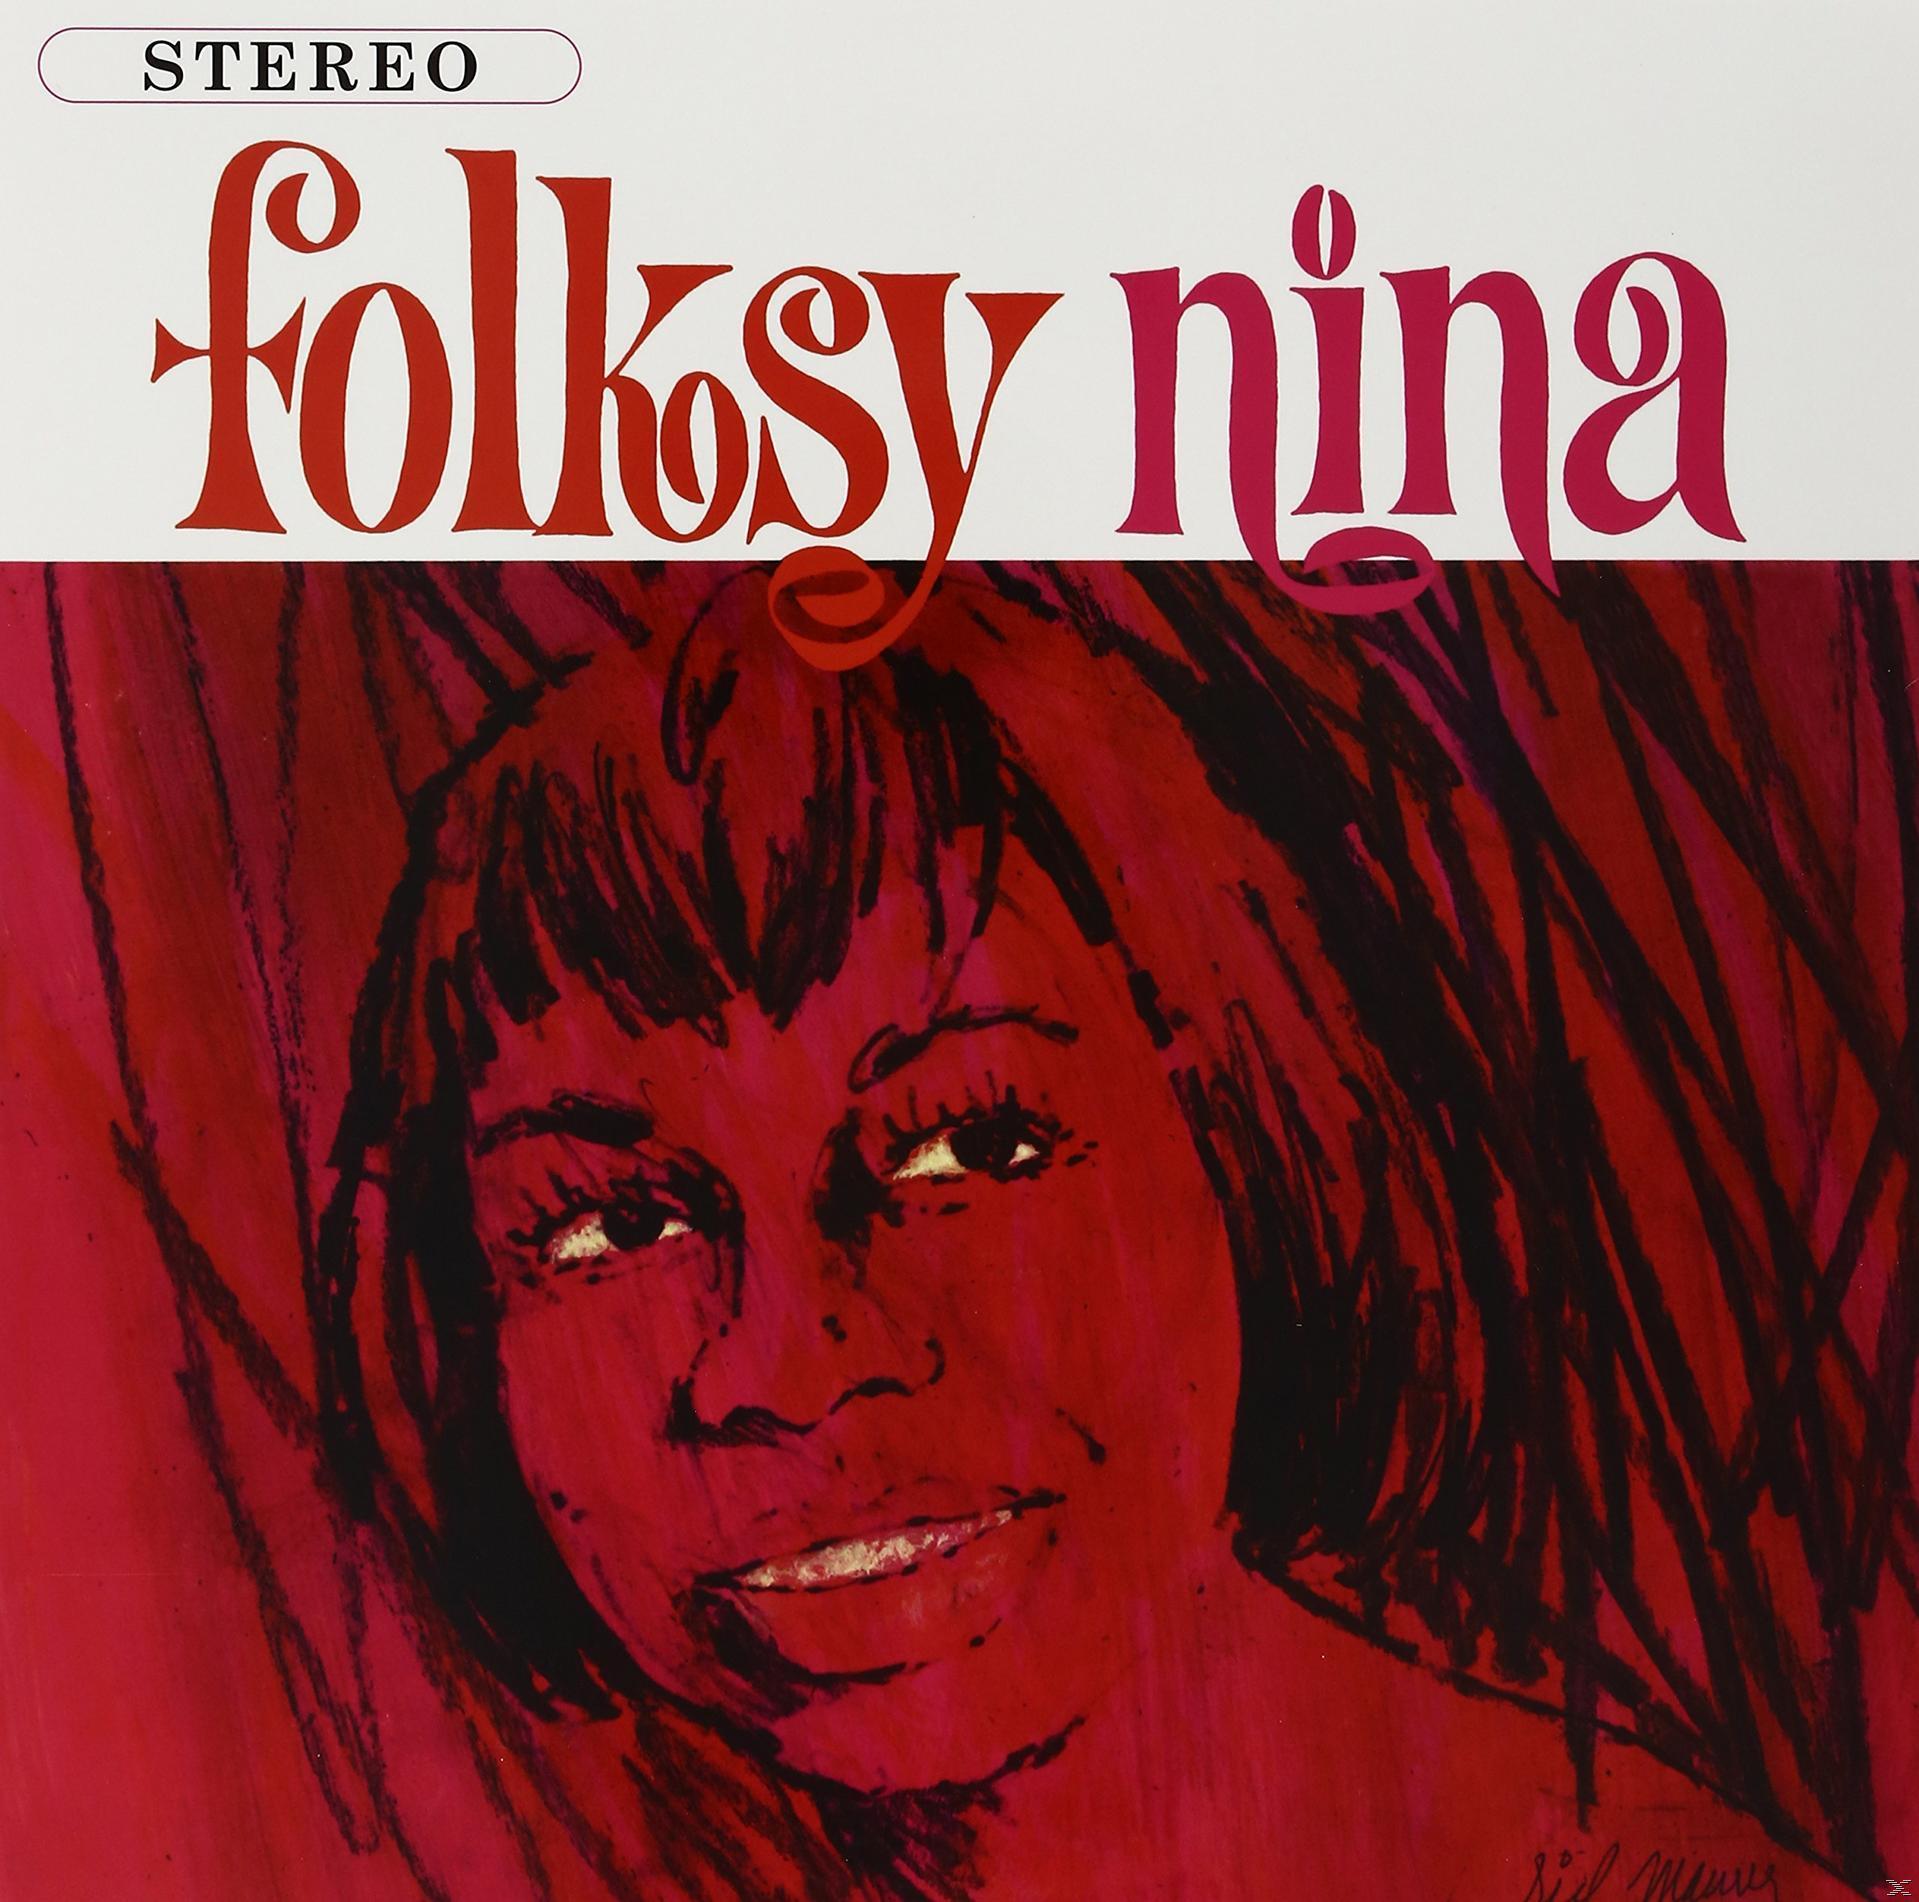 public - folksy nina